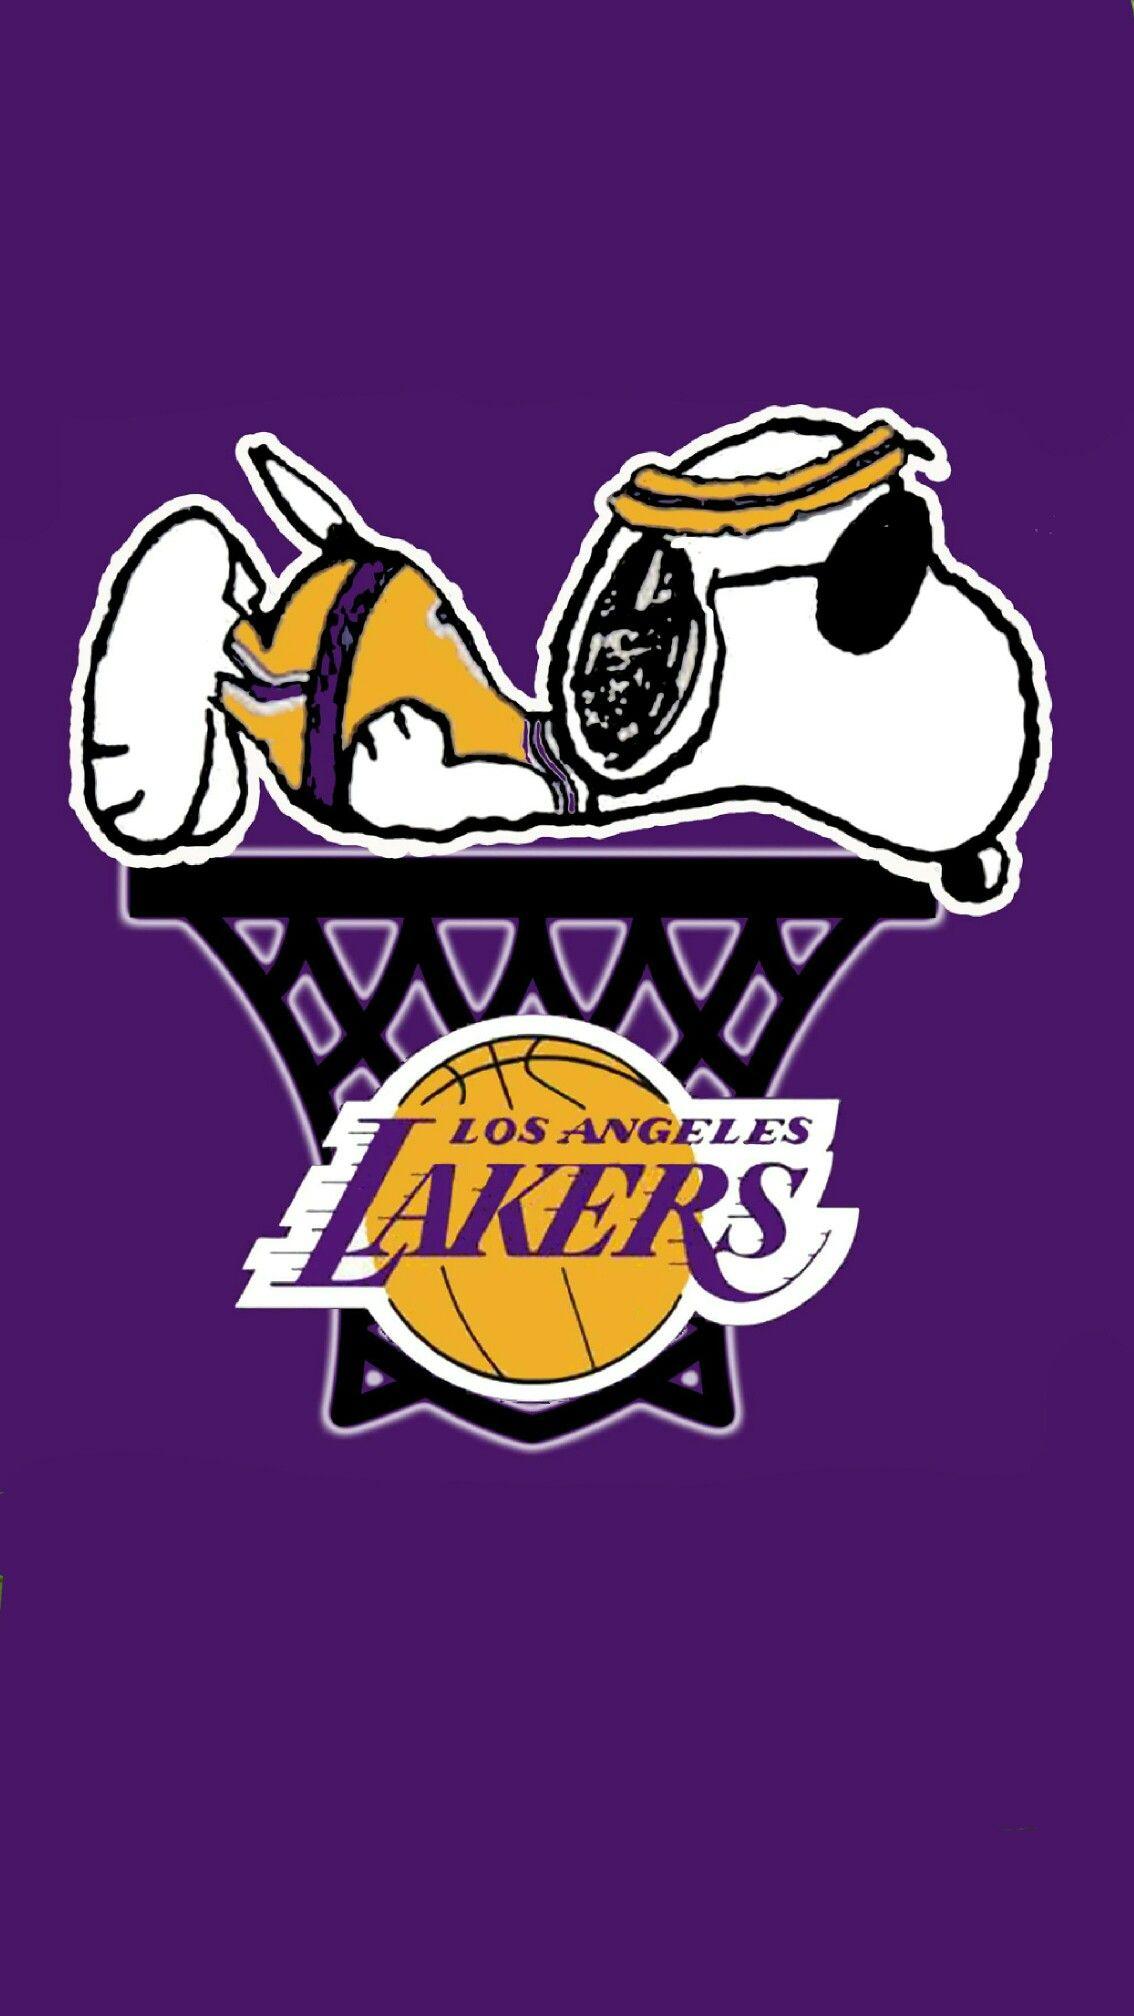 Go Lakers Lakers logo, Lakers, Lakers wallpaper